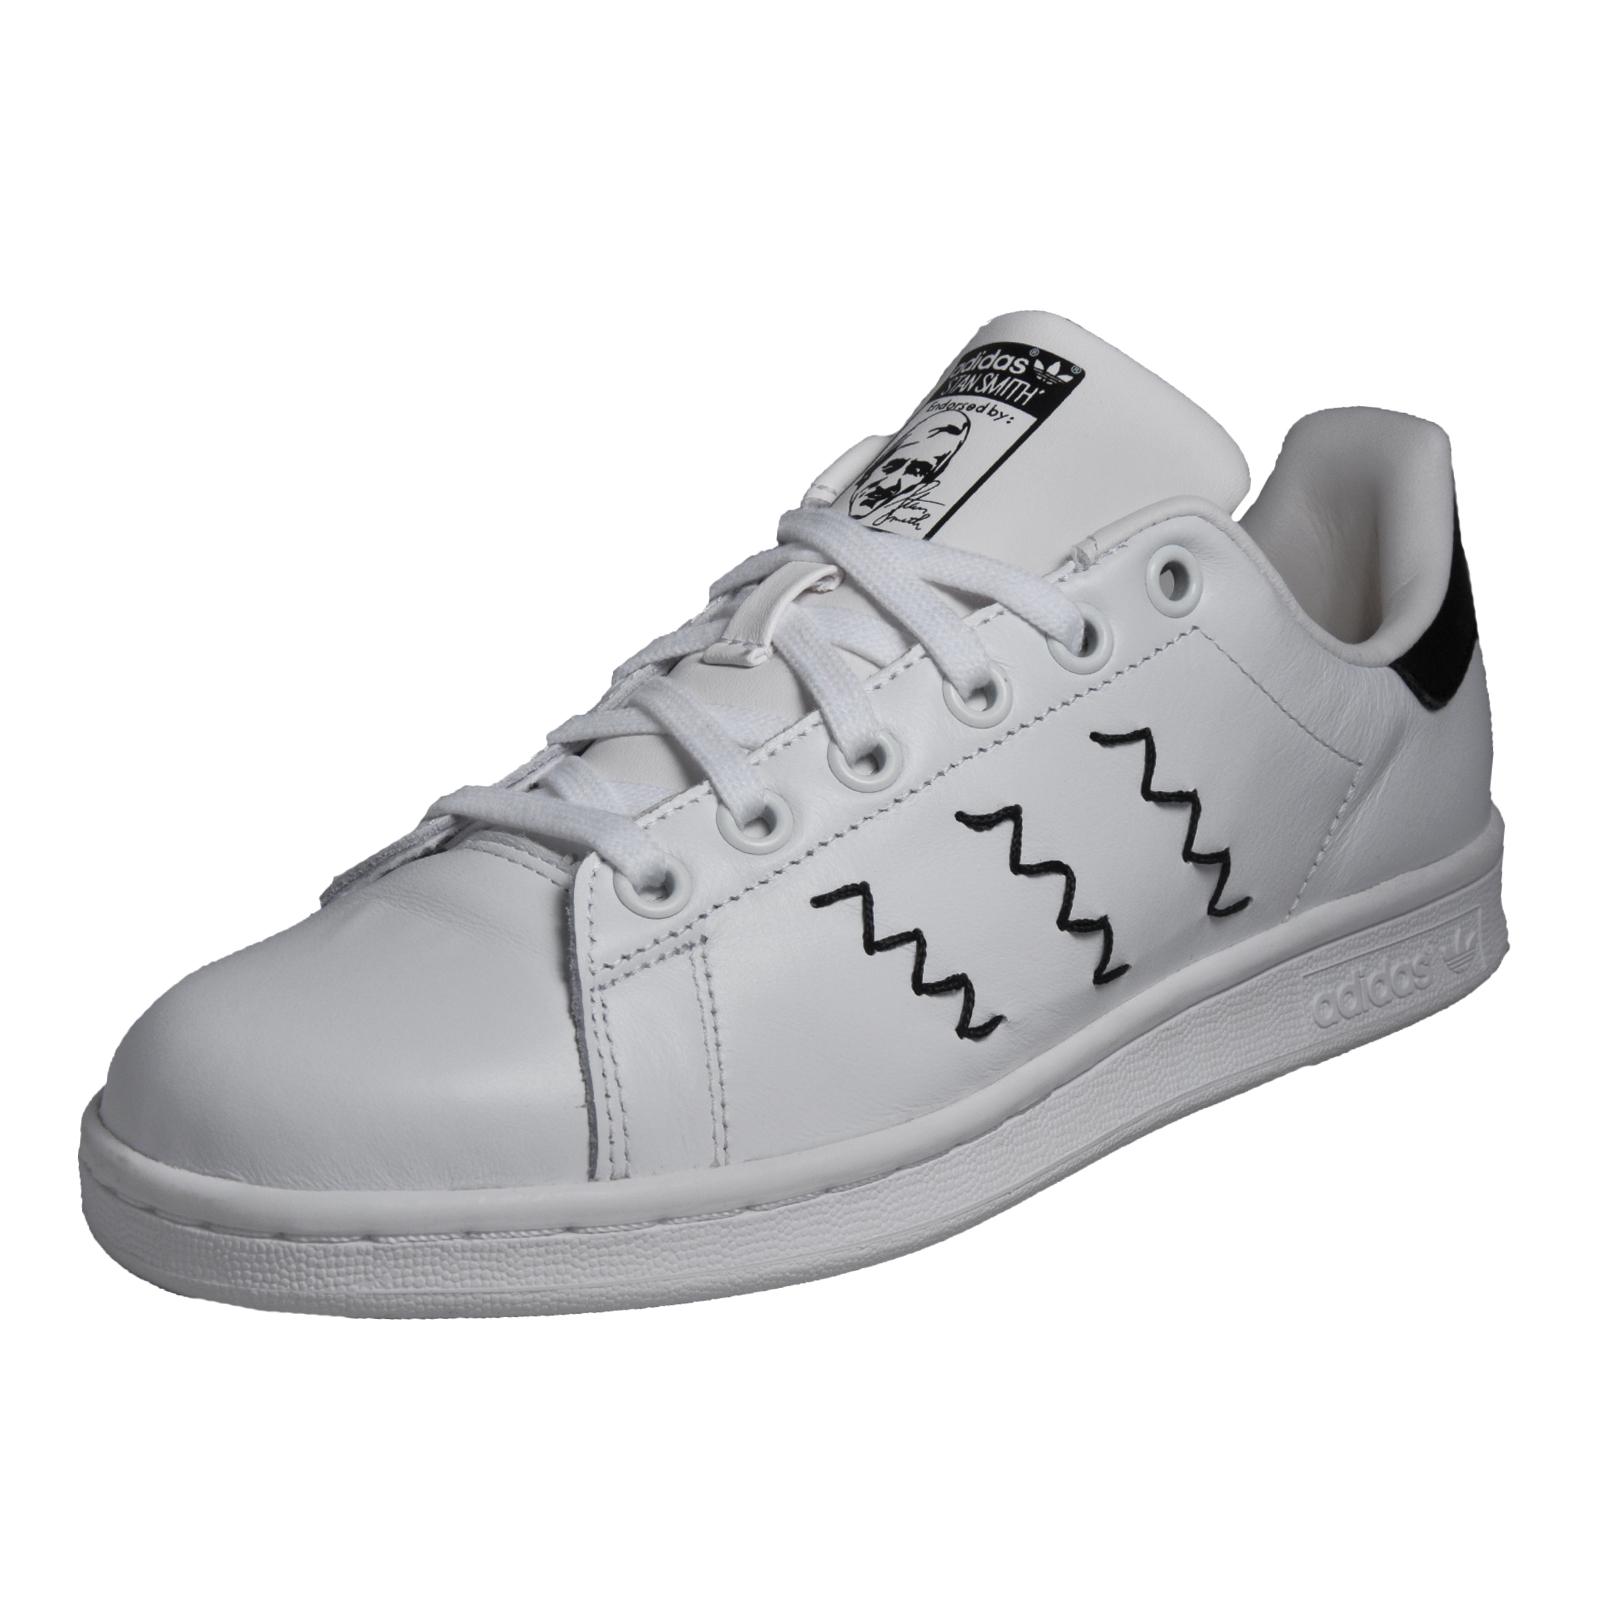 Adidas Originals Stan Smith Women's Girls Trainers White B Grade UK 7.5 Only